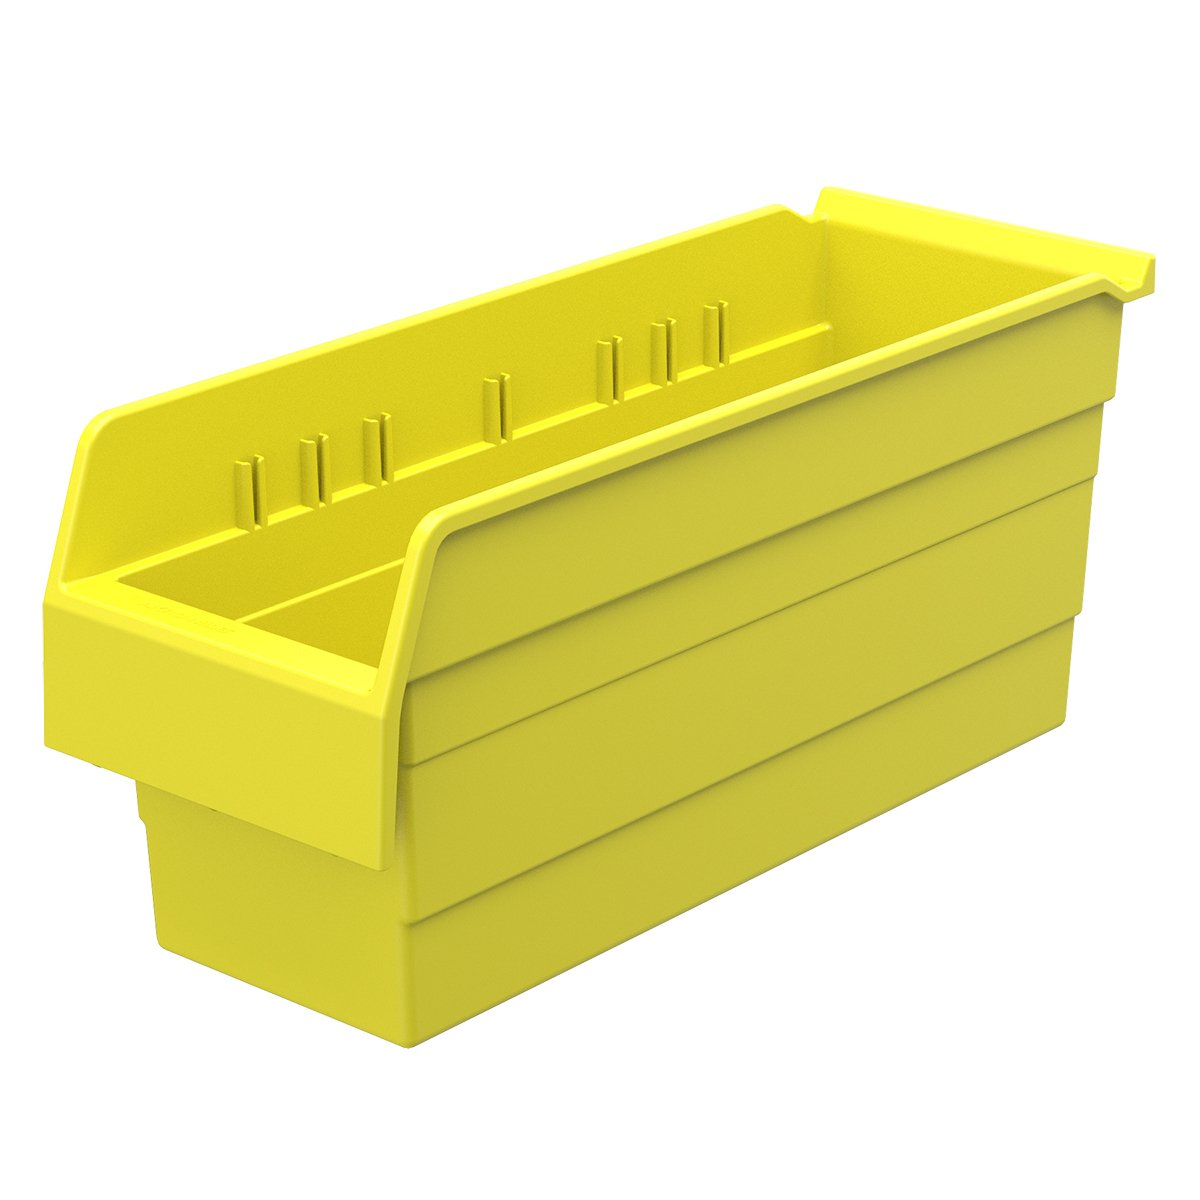 Akro-Mils 30868 ShelfMax 8 Plastic Nesting Shelf Bin Box, 18-Inch x 6-Inch x 8-Inch, Yellow, 10-Pack